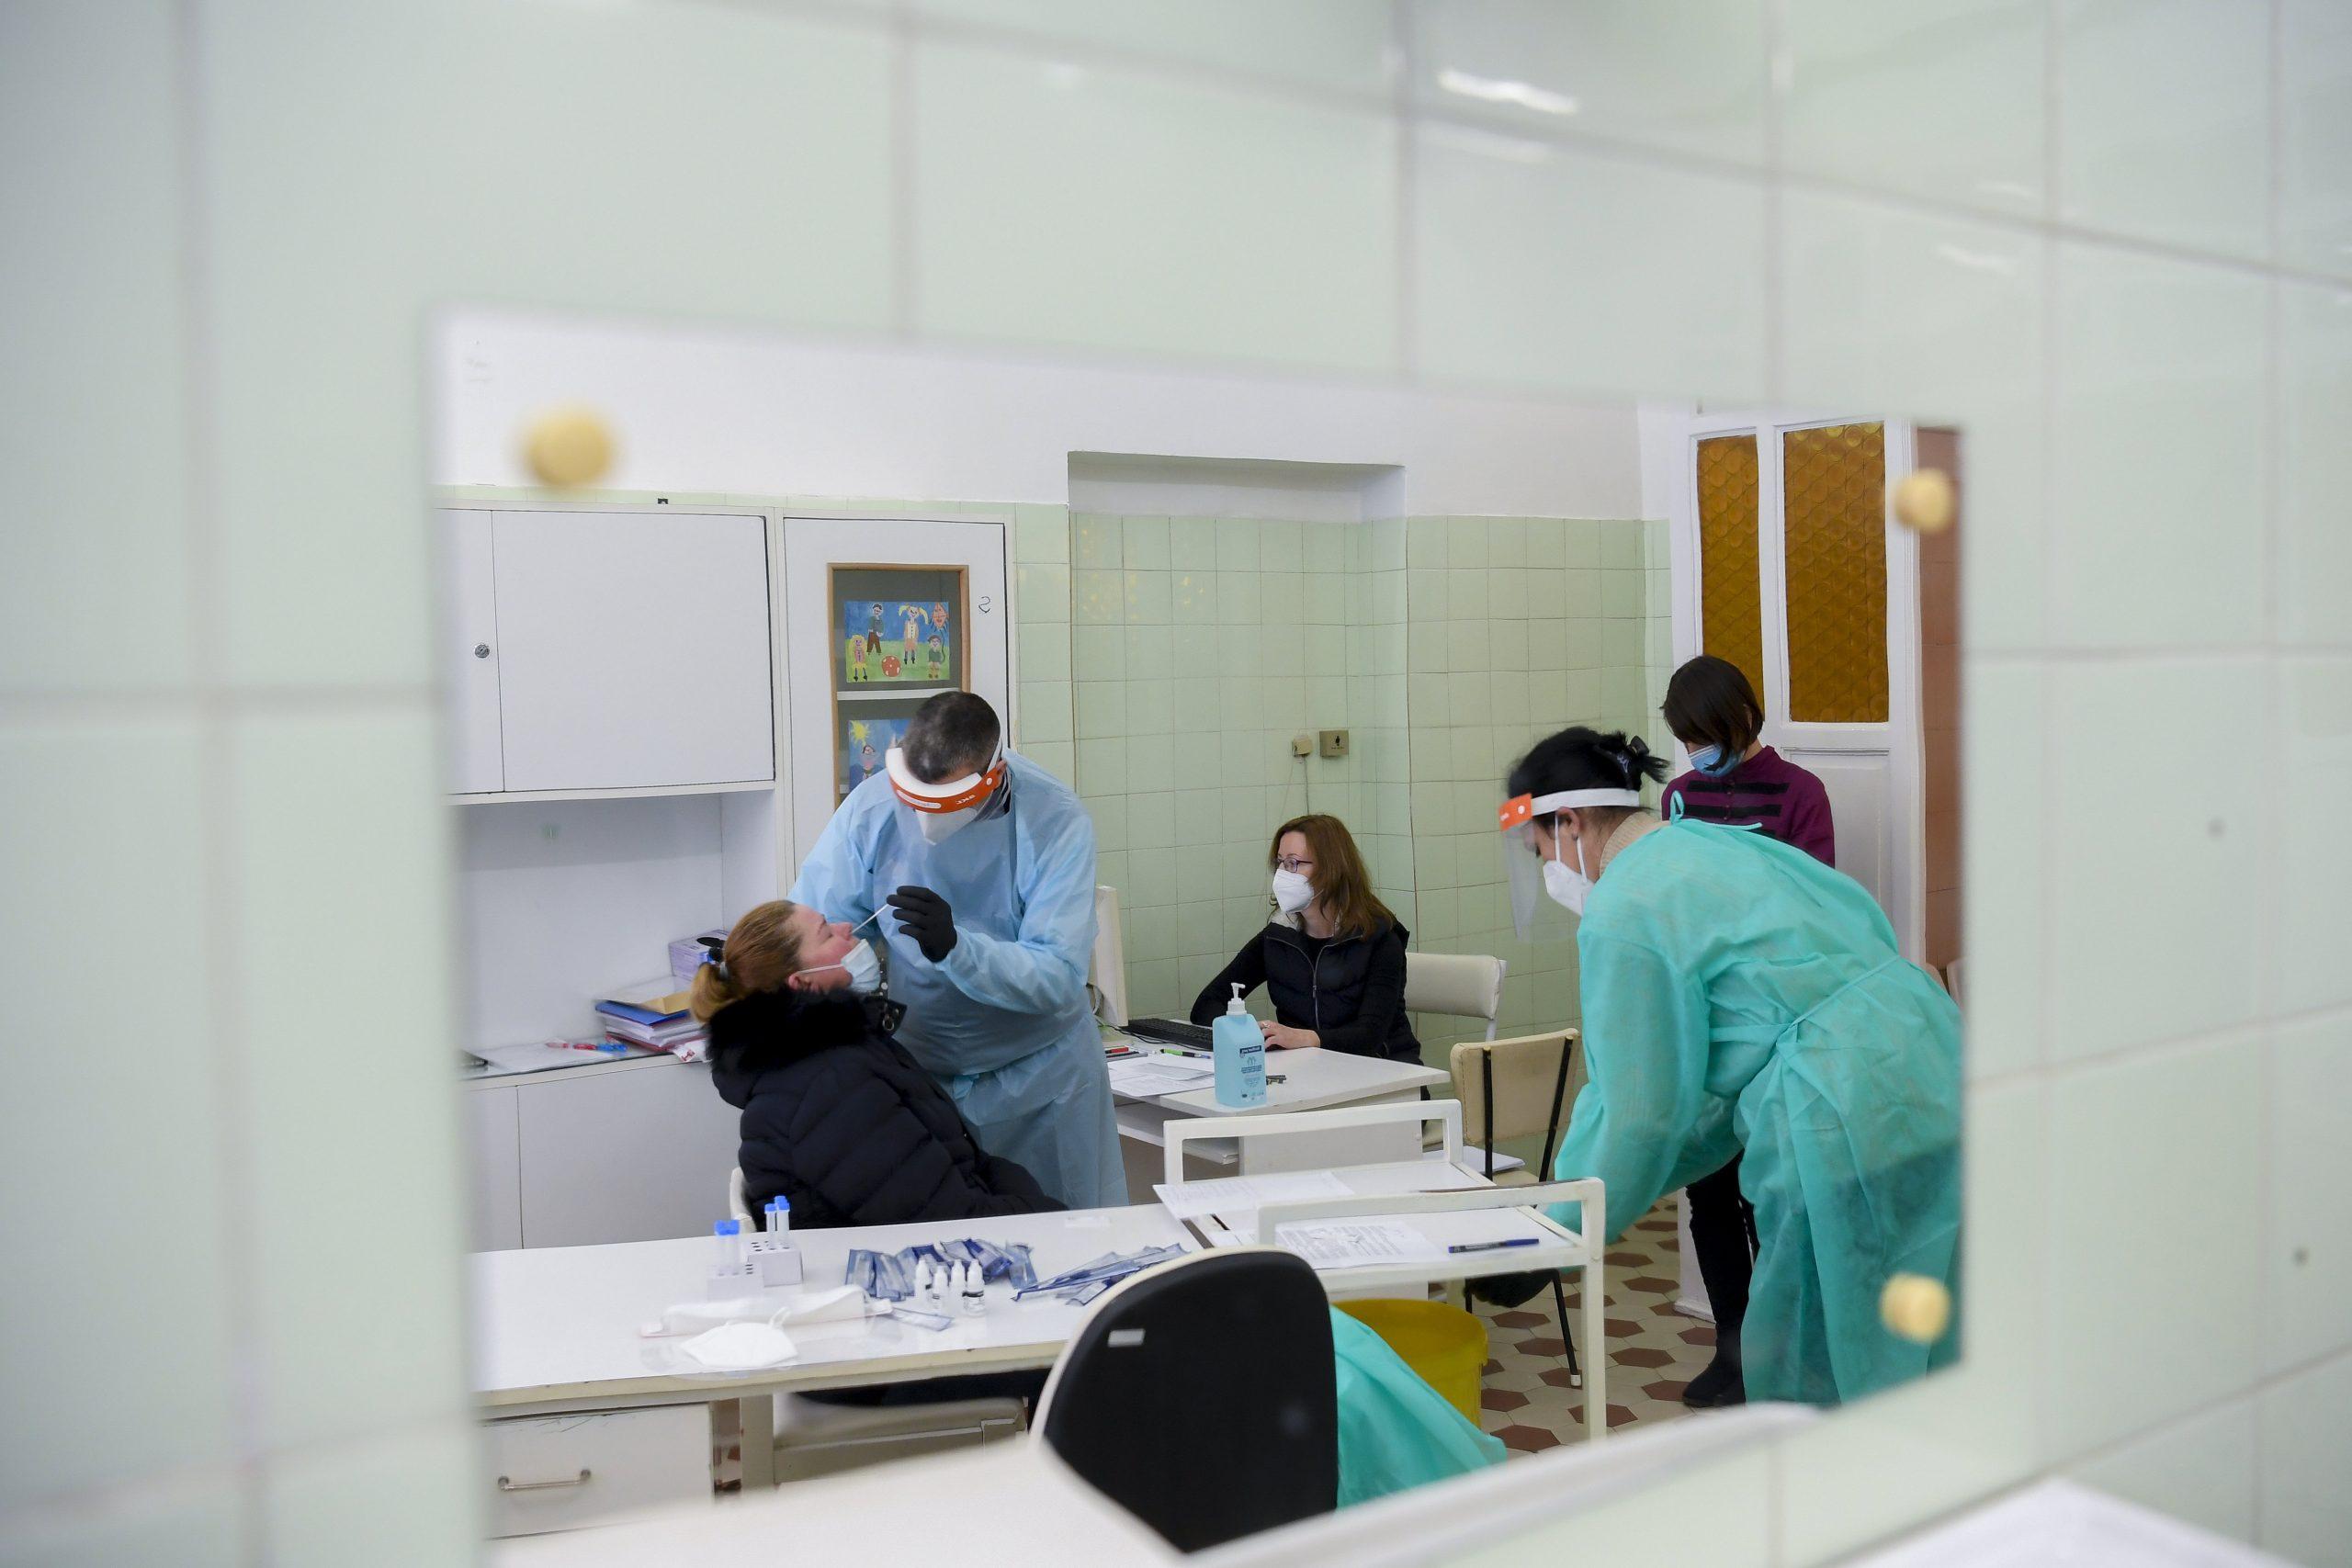 Corona am Dienstag: 2764 Neuinfektionen, 130 Todesfälle